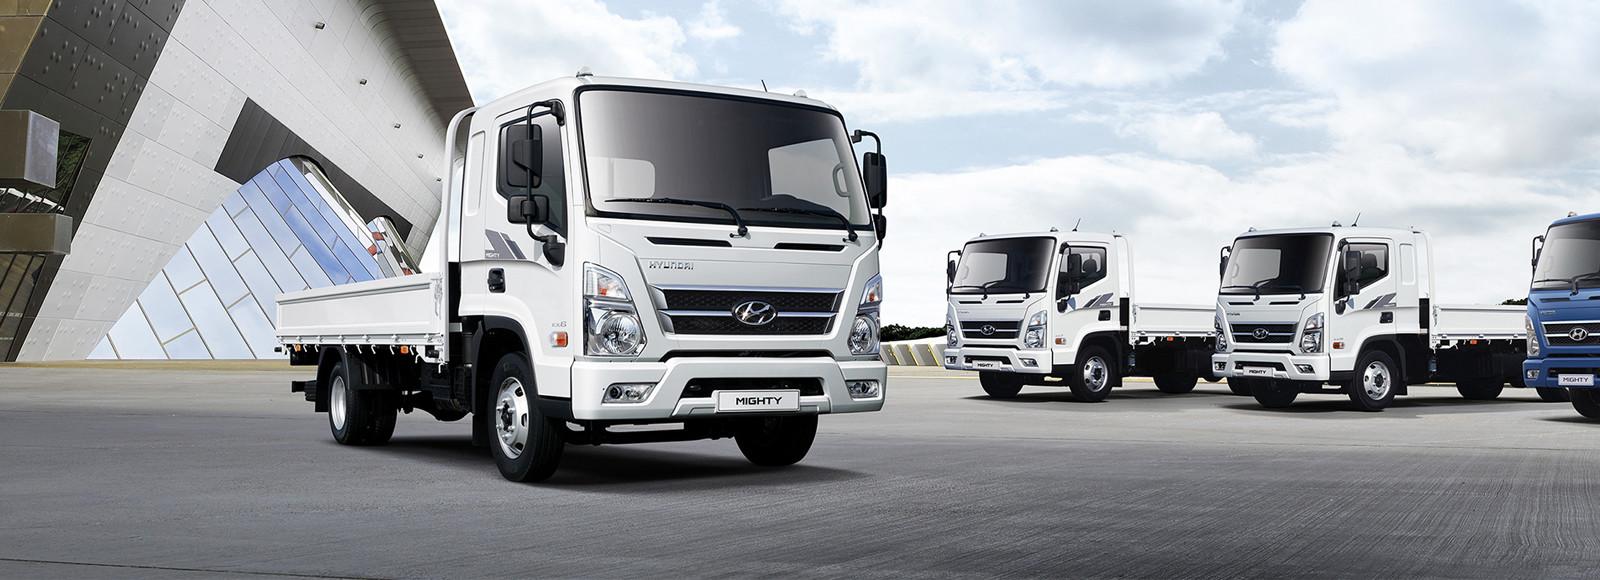 news santa roadshow unexpected truck part trucks cruz debuts crossover show at detroit pickup concept compact hyundai auto is hyundaisantacruz